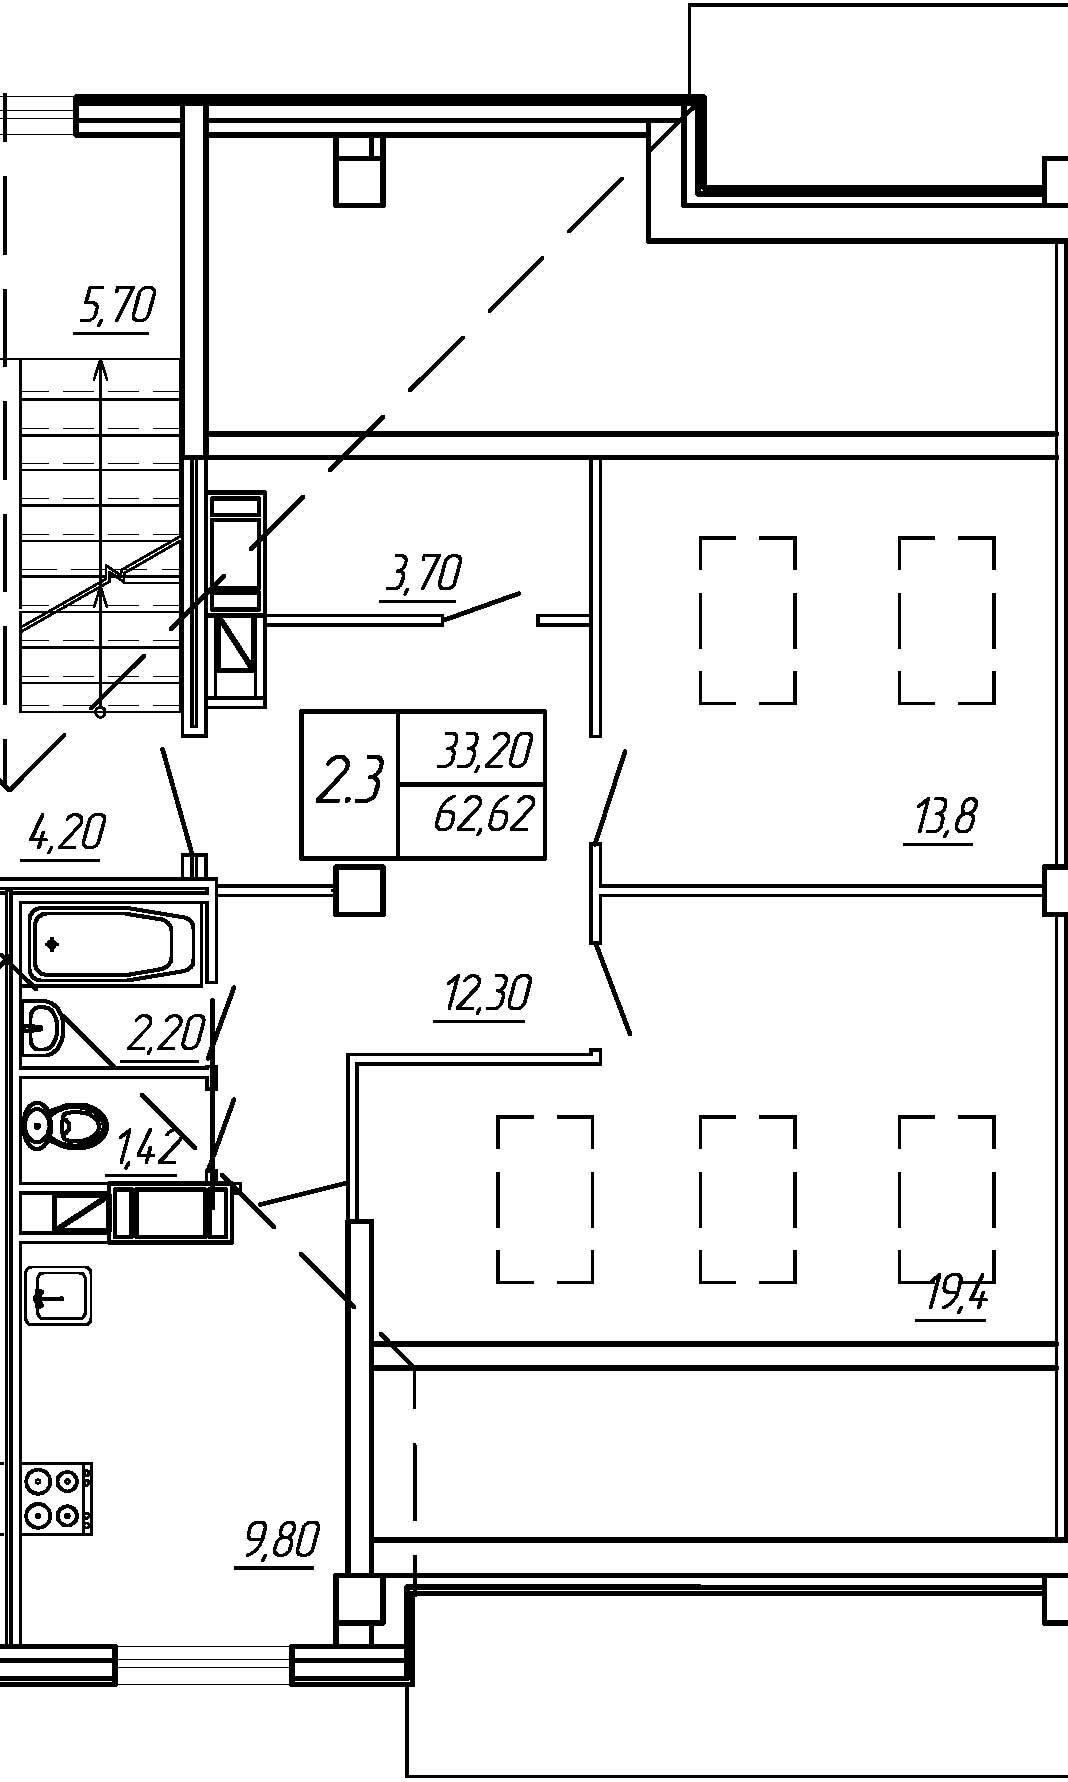 Жилойдом по ул.Мохова, 44(по ГП), Двухкомнатная квартира площадью 62.62 м2